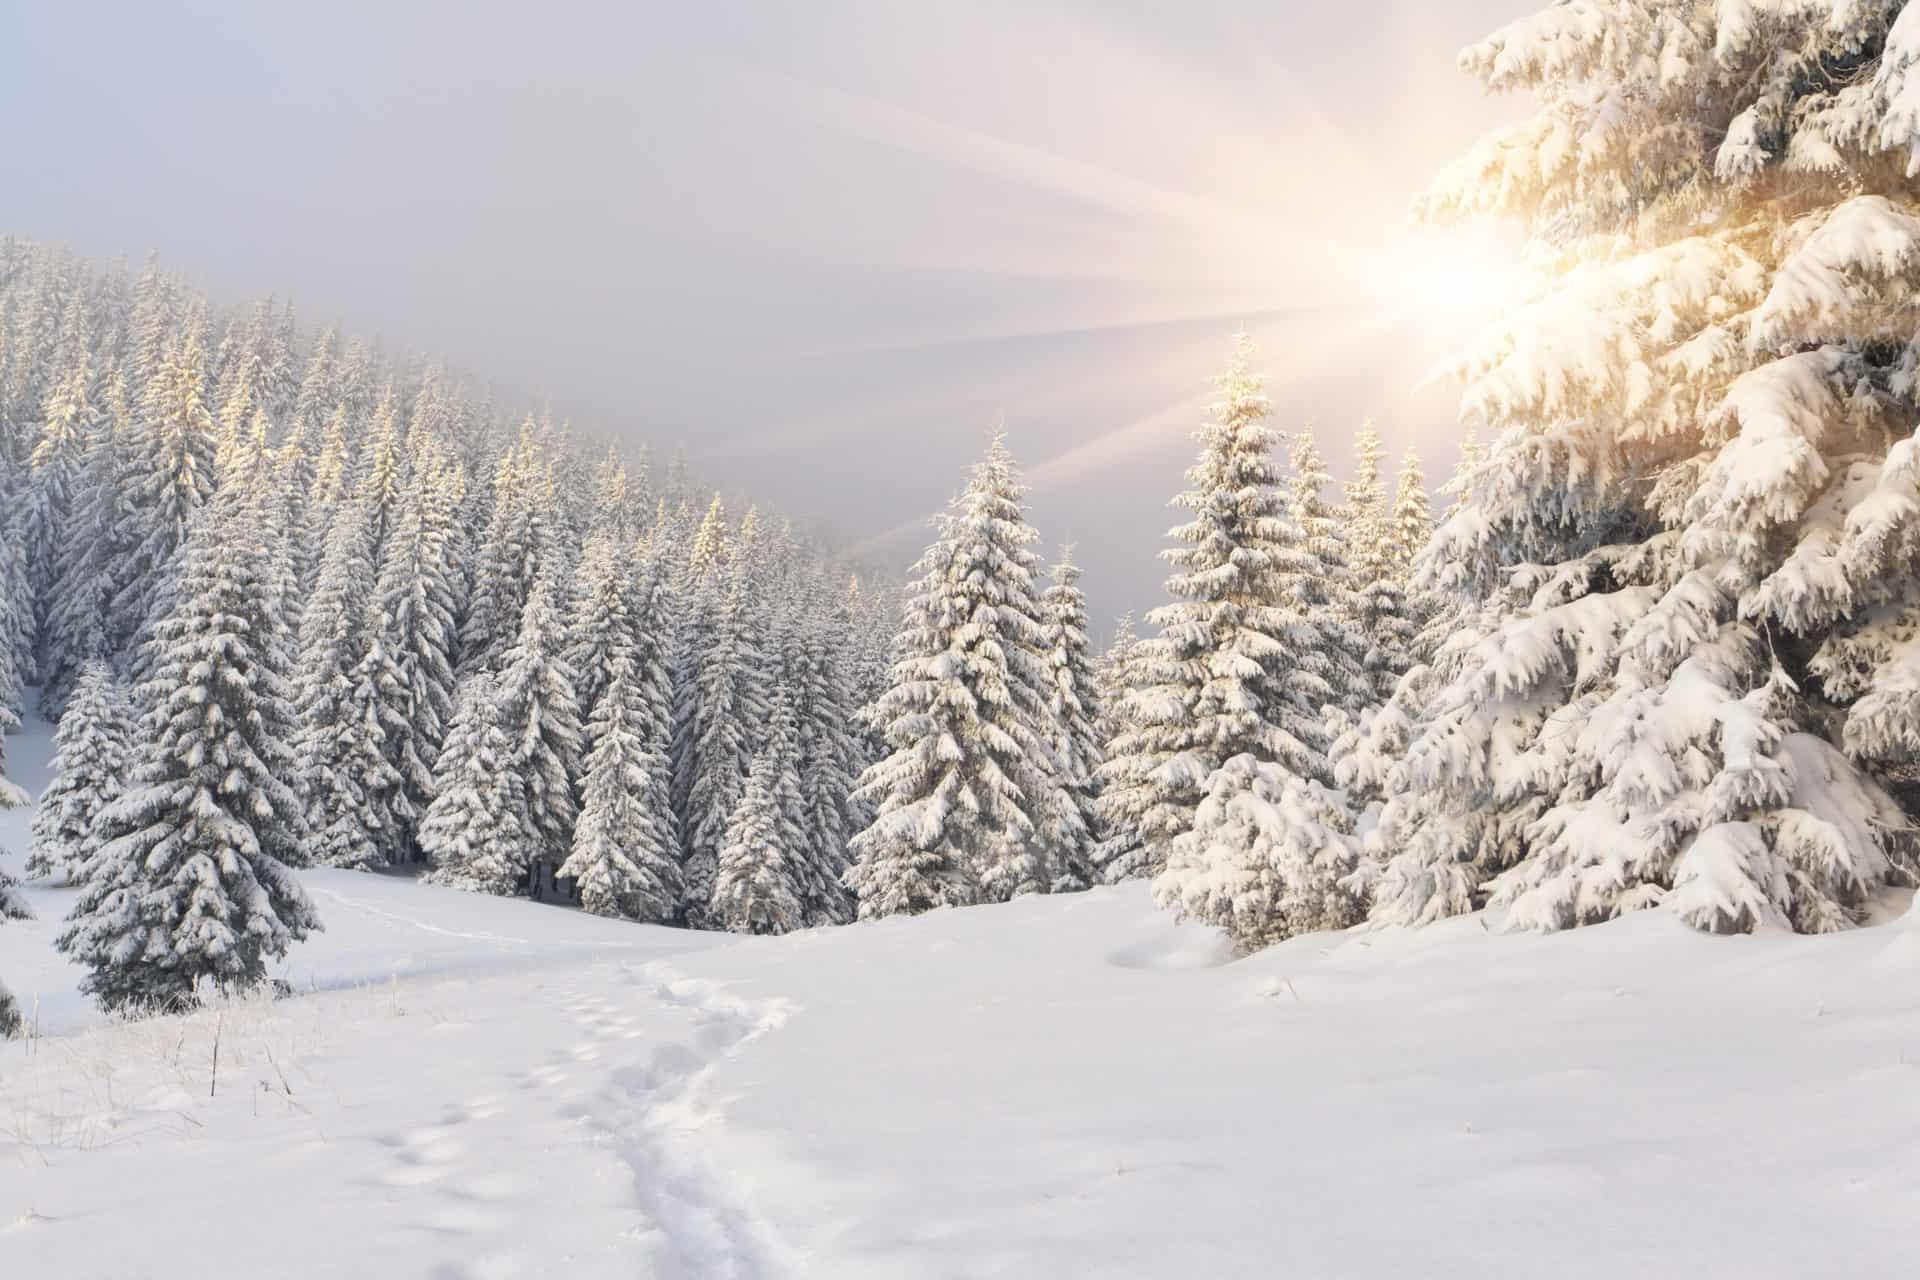 Winter-solstice-snowy-scene